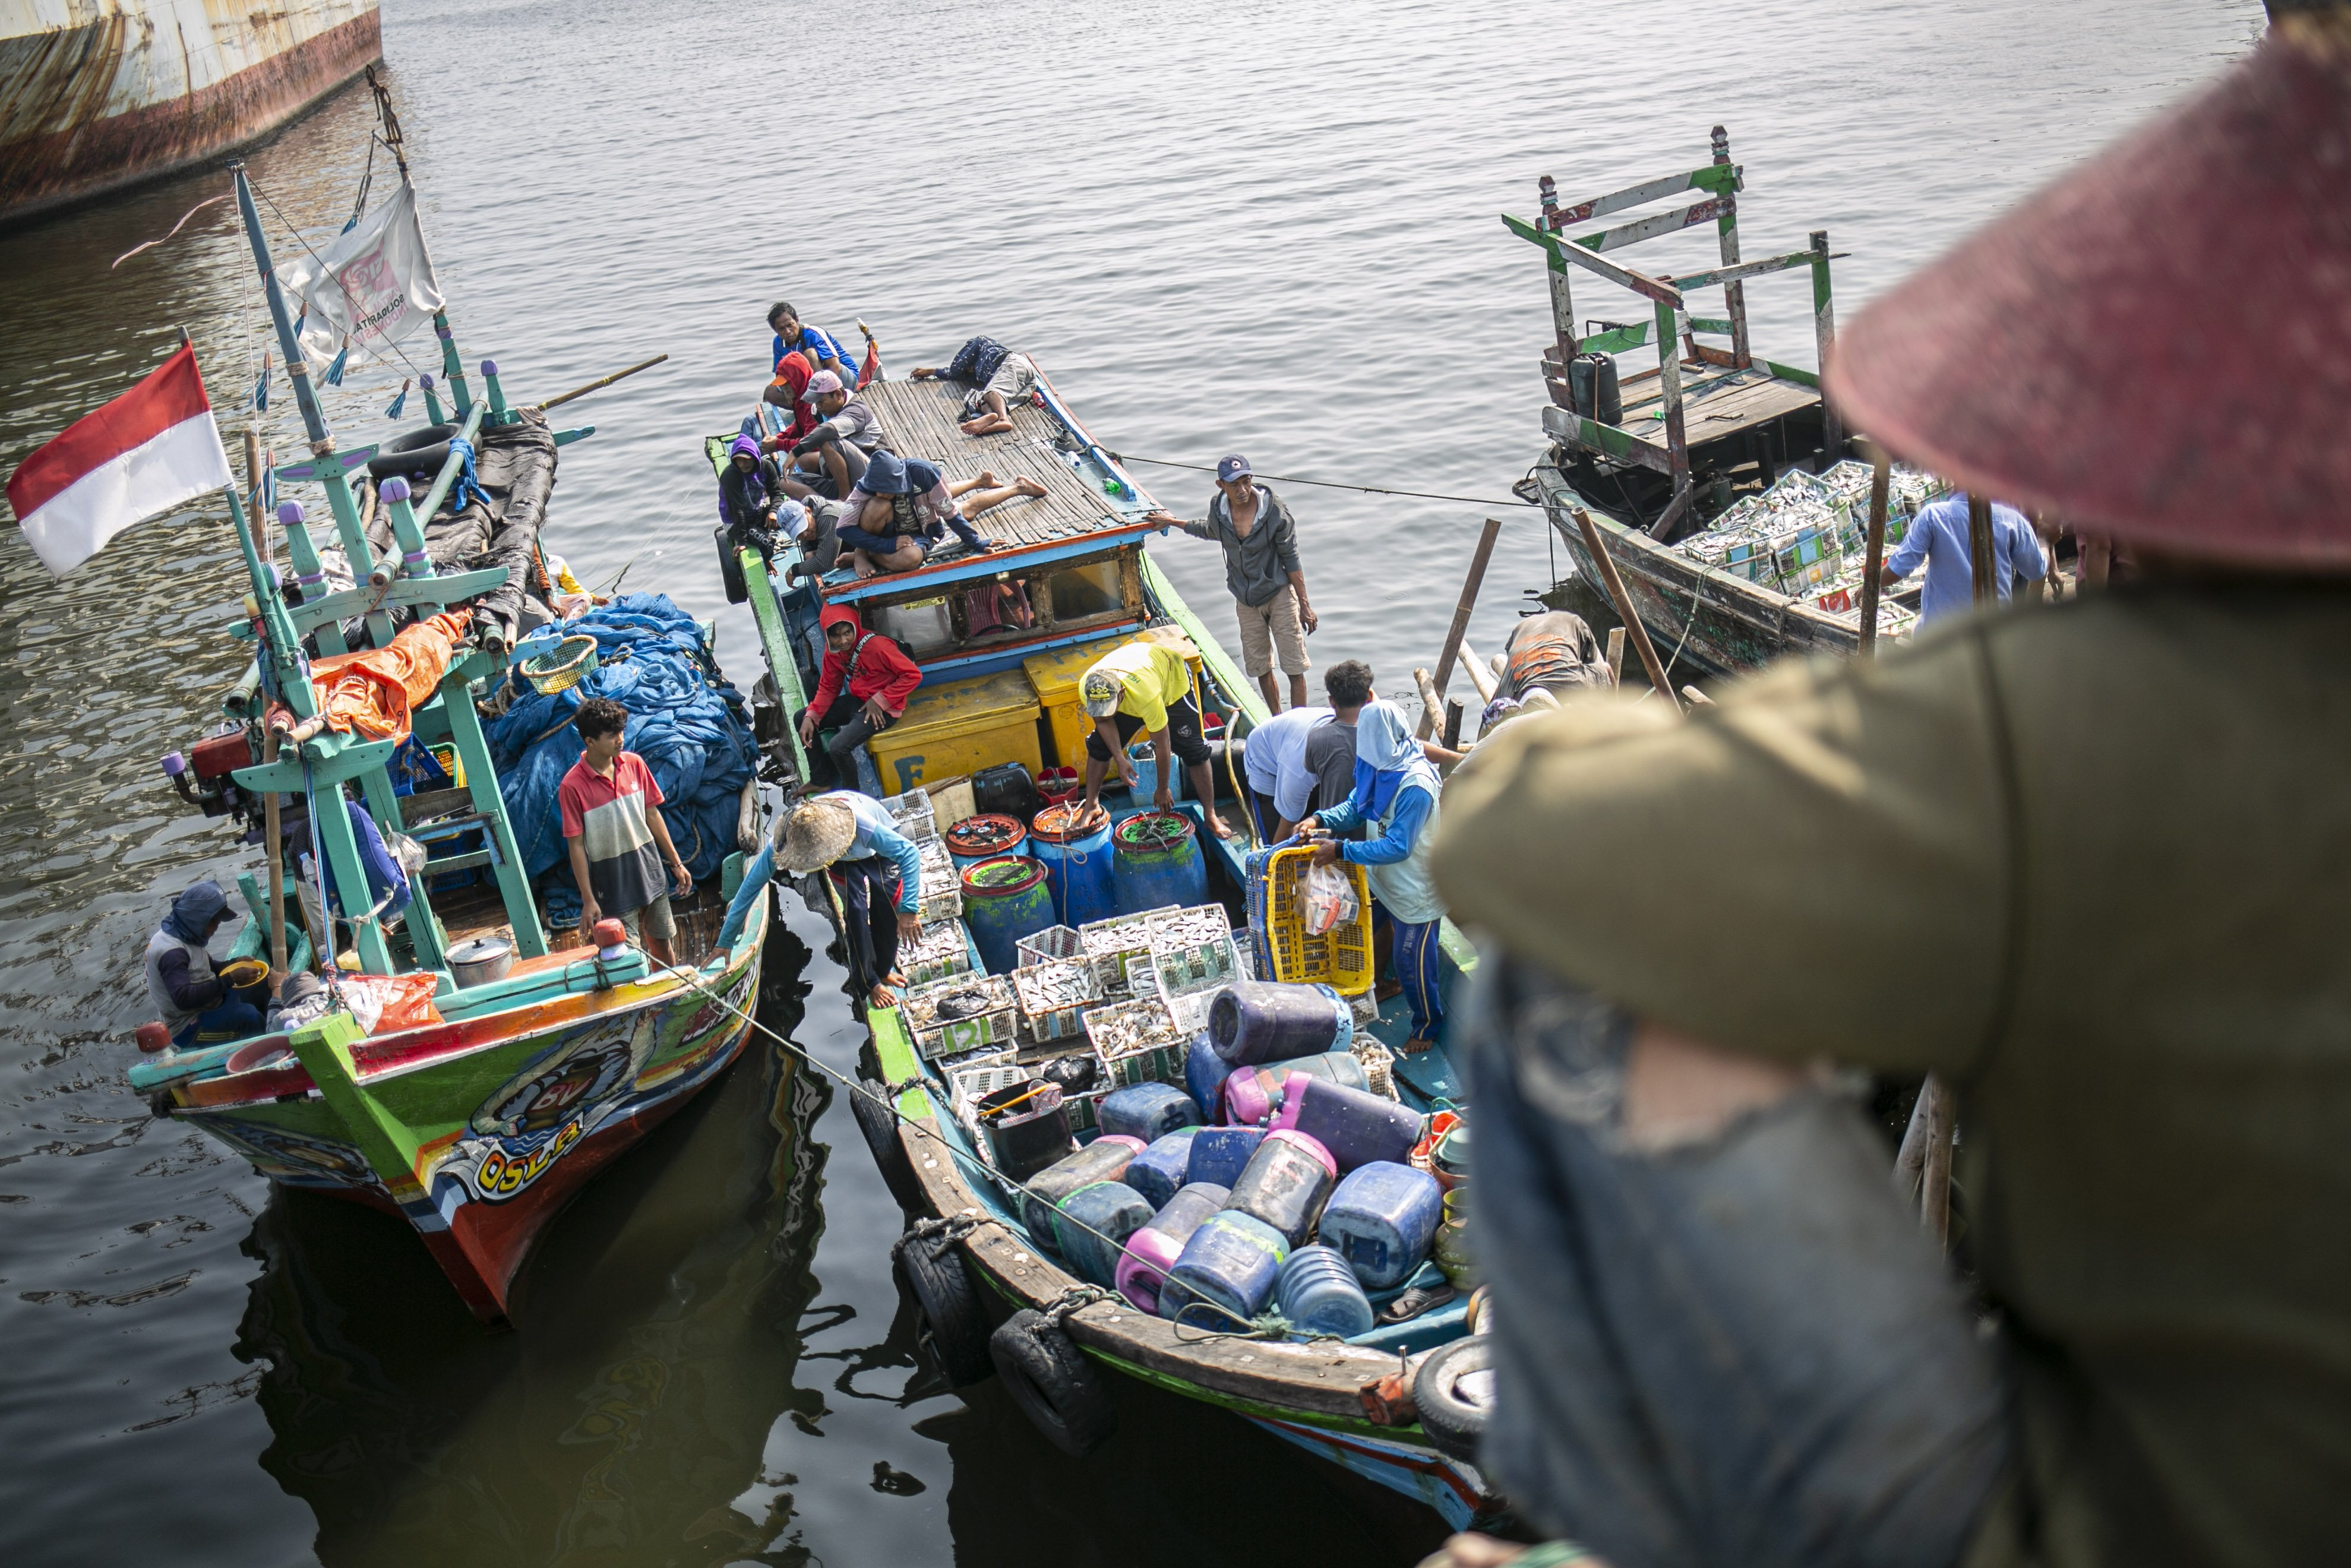 Sejumlah nelayan menurunkan ikan hasil tangkapan di Kampung Nelayan, Jakarta Utara, Minggu (9/8/2020). Kesatuan Nelayan Tradisional Indonesia (KNTI) mengklaim penurunan penjualan tangkapan nelayan mencapai 21 persen dan pendapatan hingga 90 persen akibat merebaknya virus covid-19.